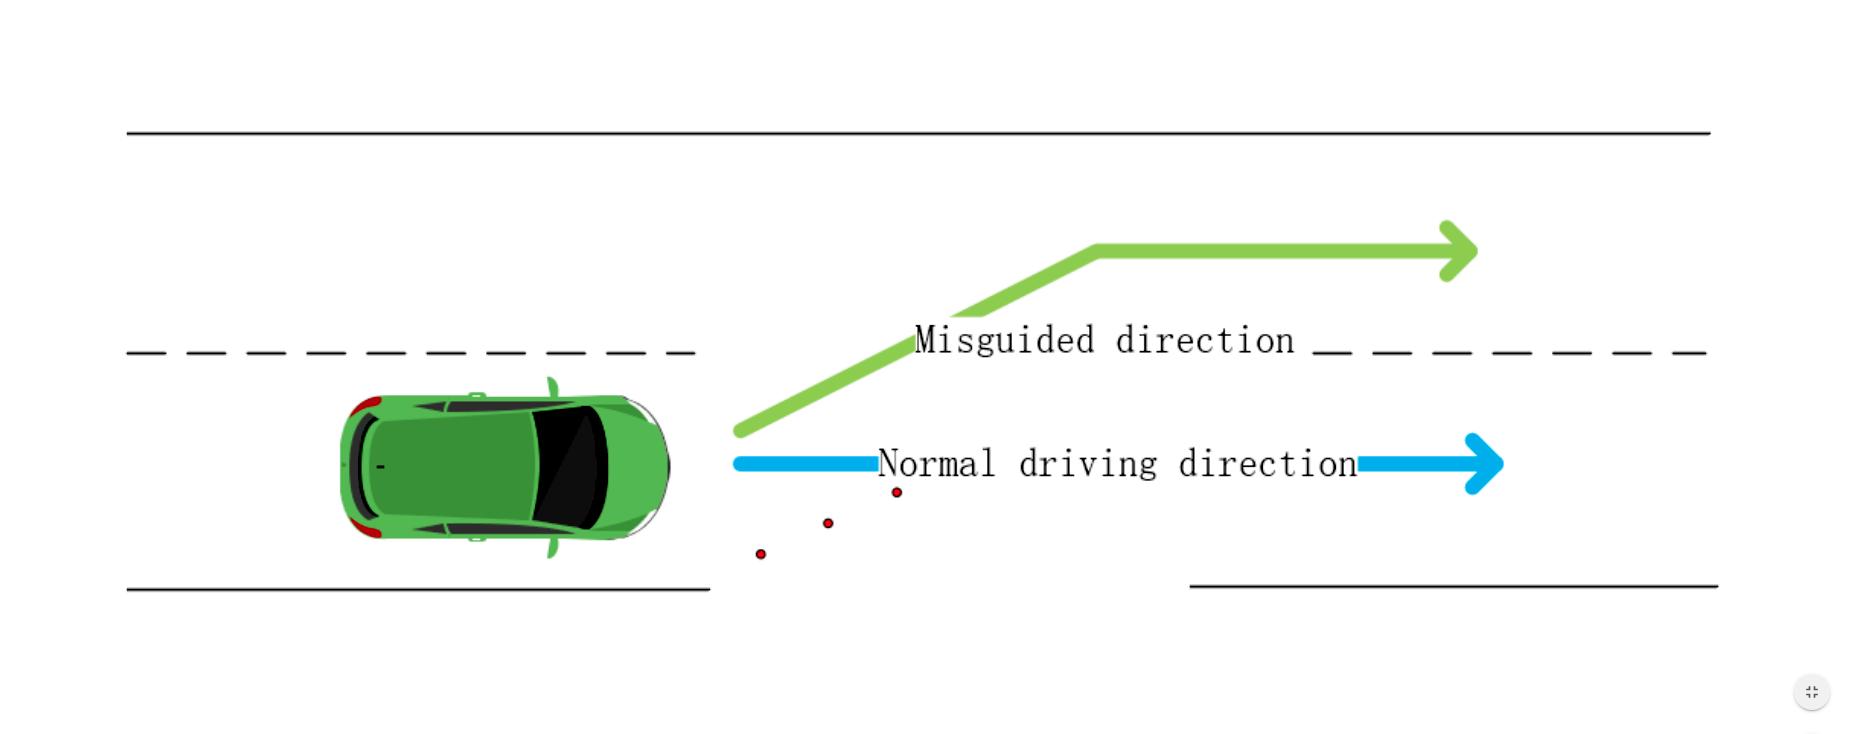 Researchers trick Tesla Autopilot into steering into